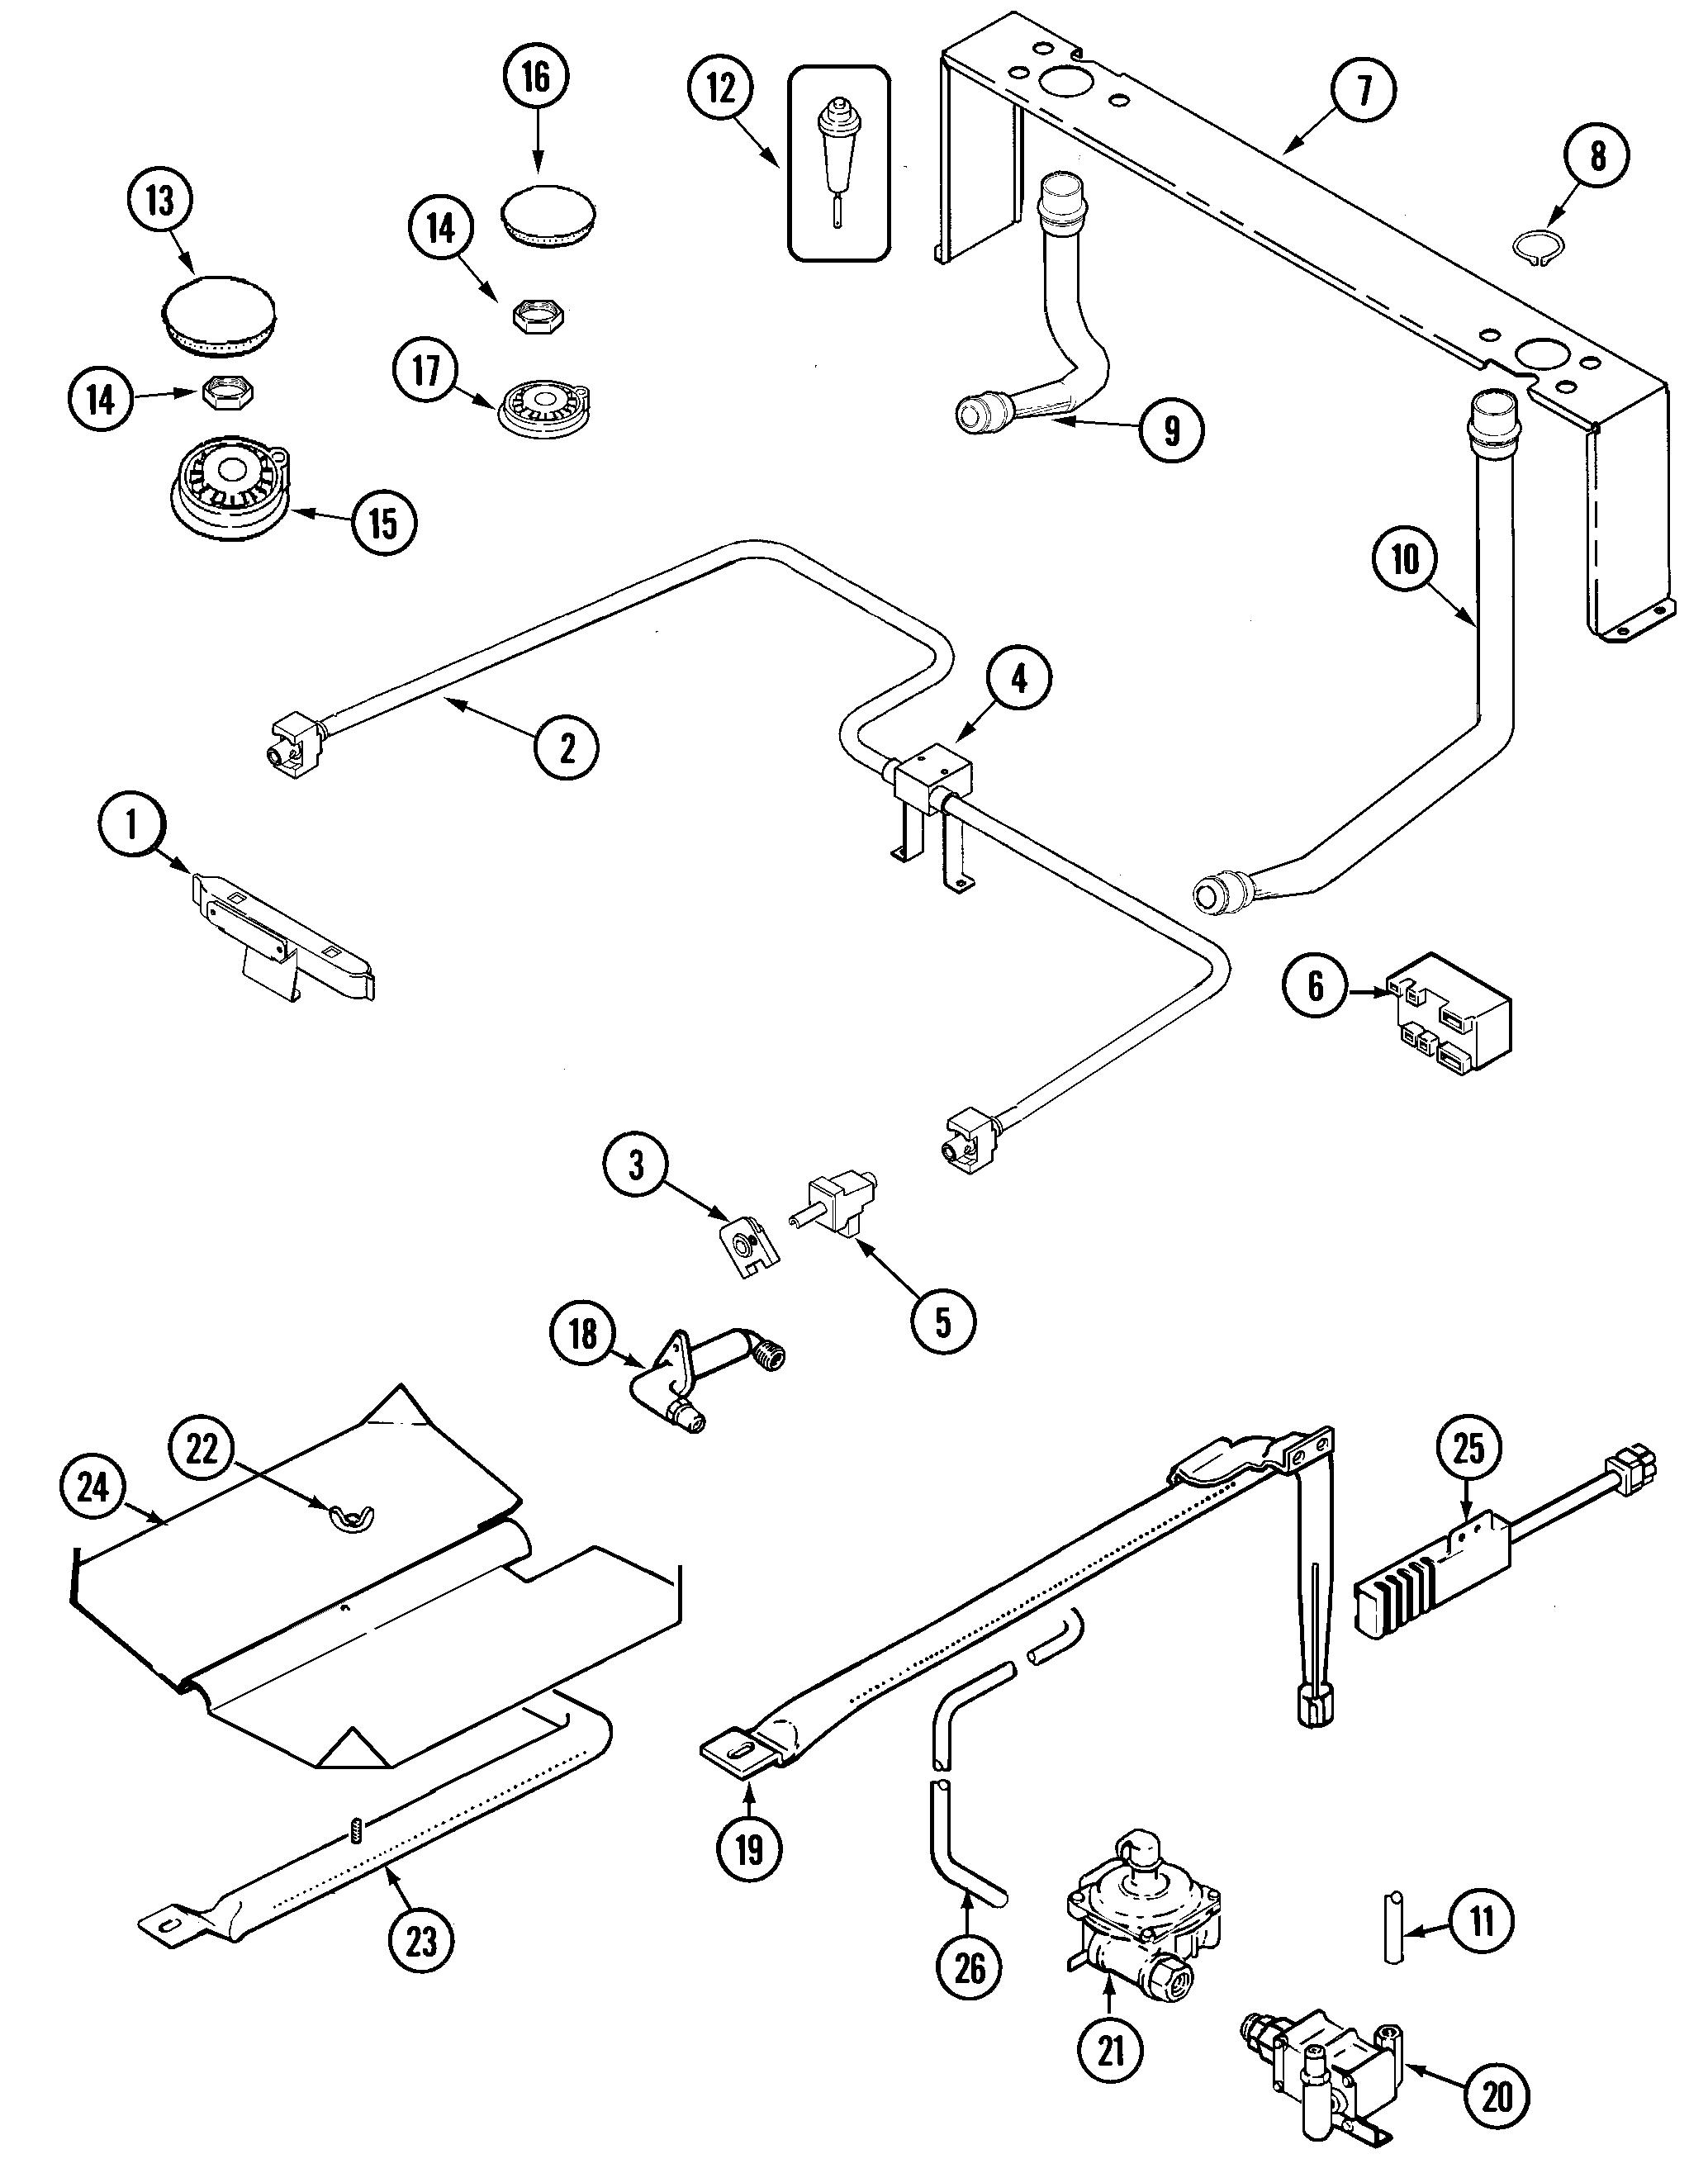 jenn-air jgs8750adb slide-in gas range timer